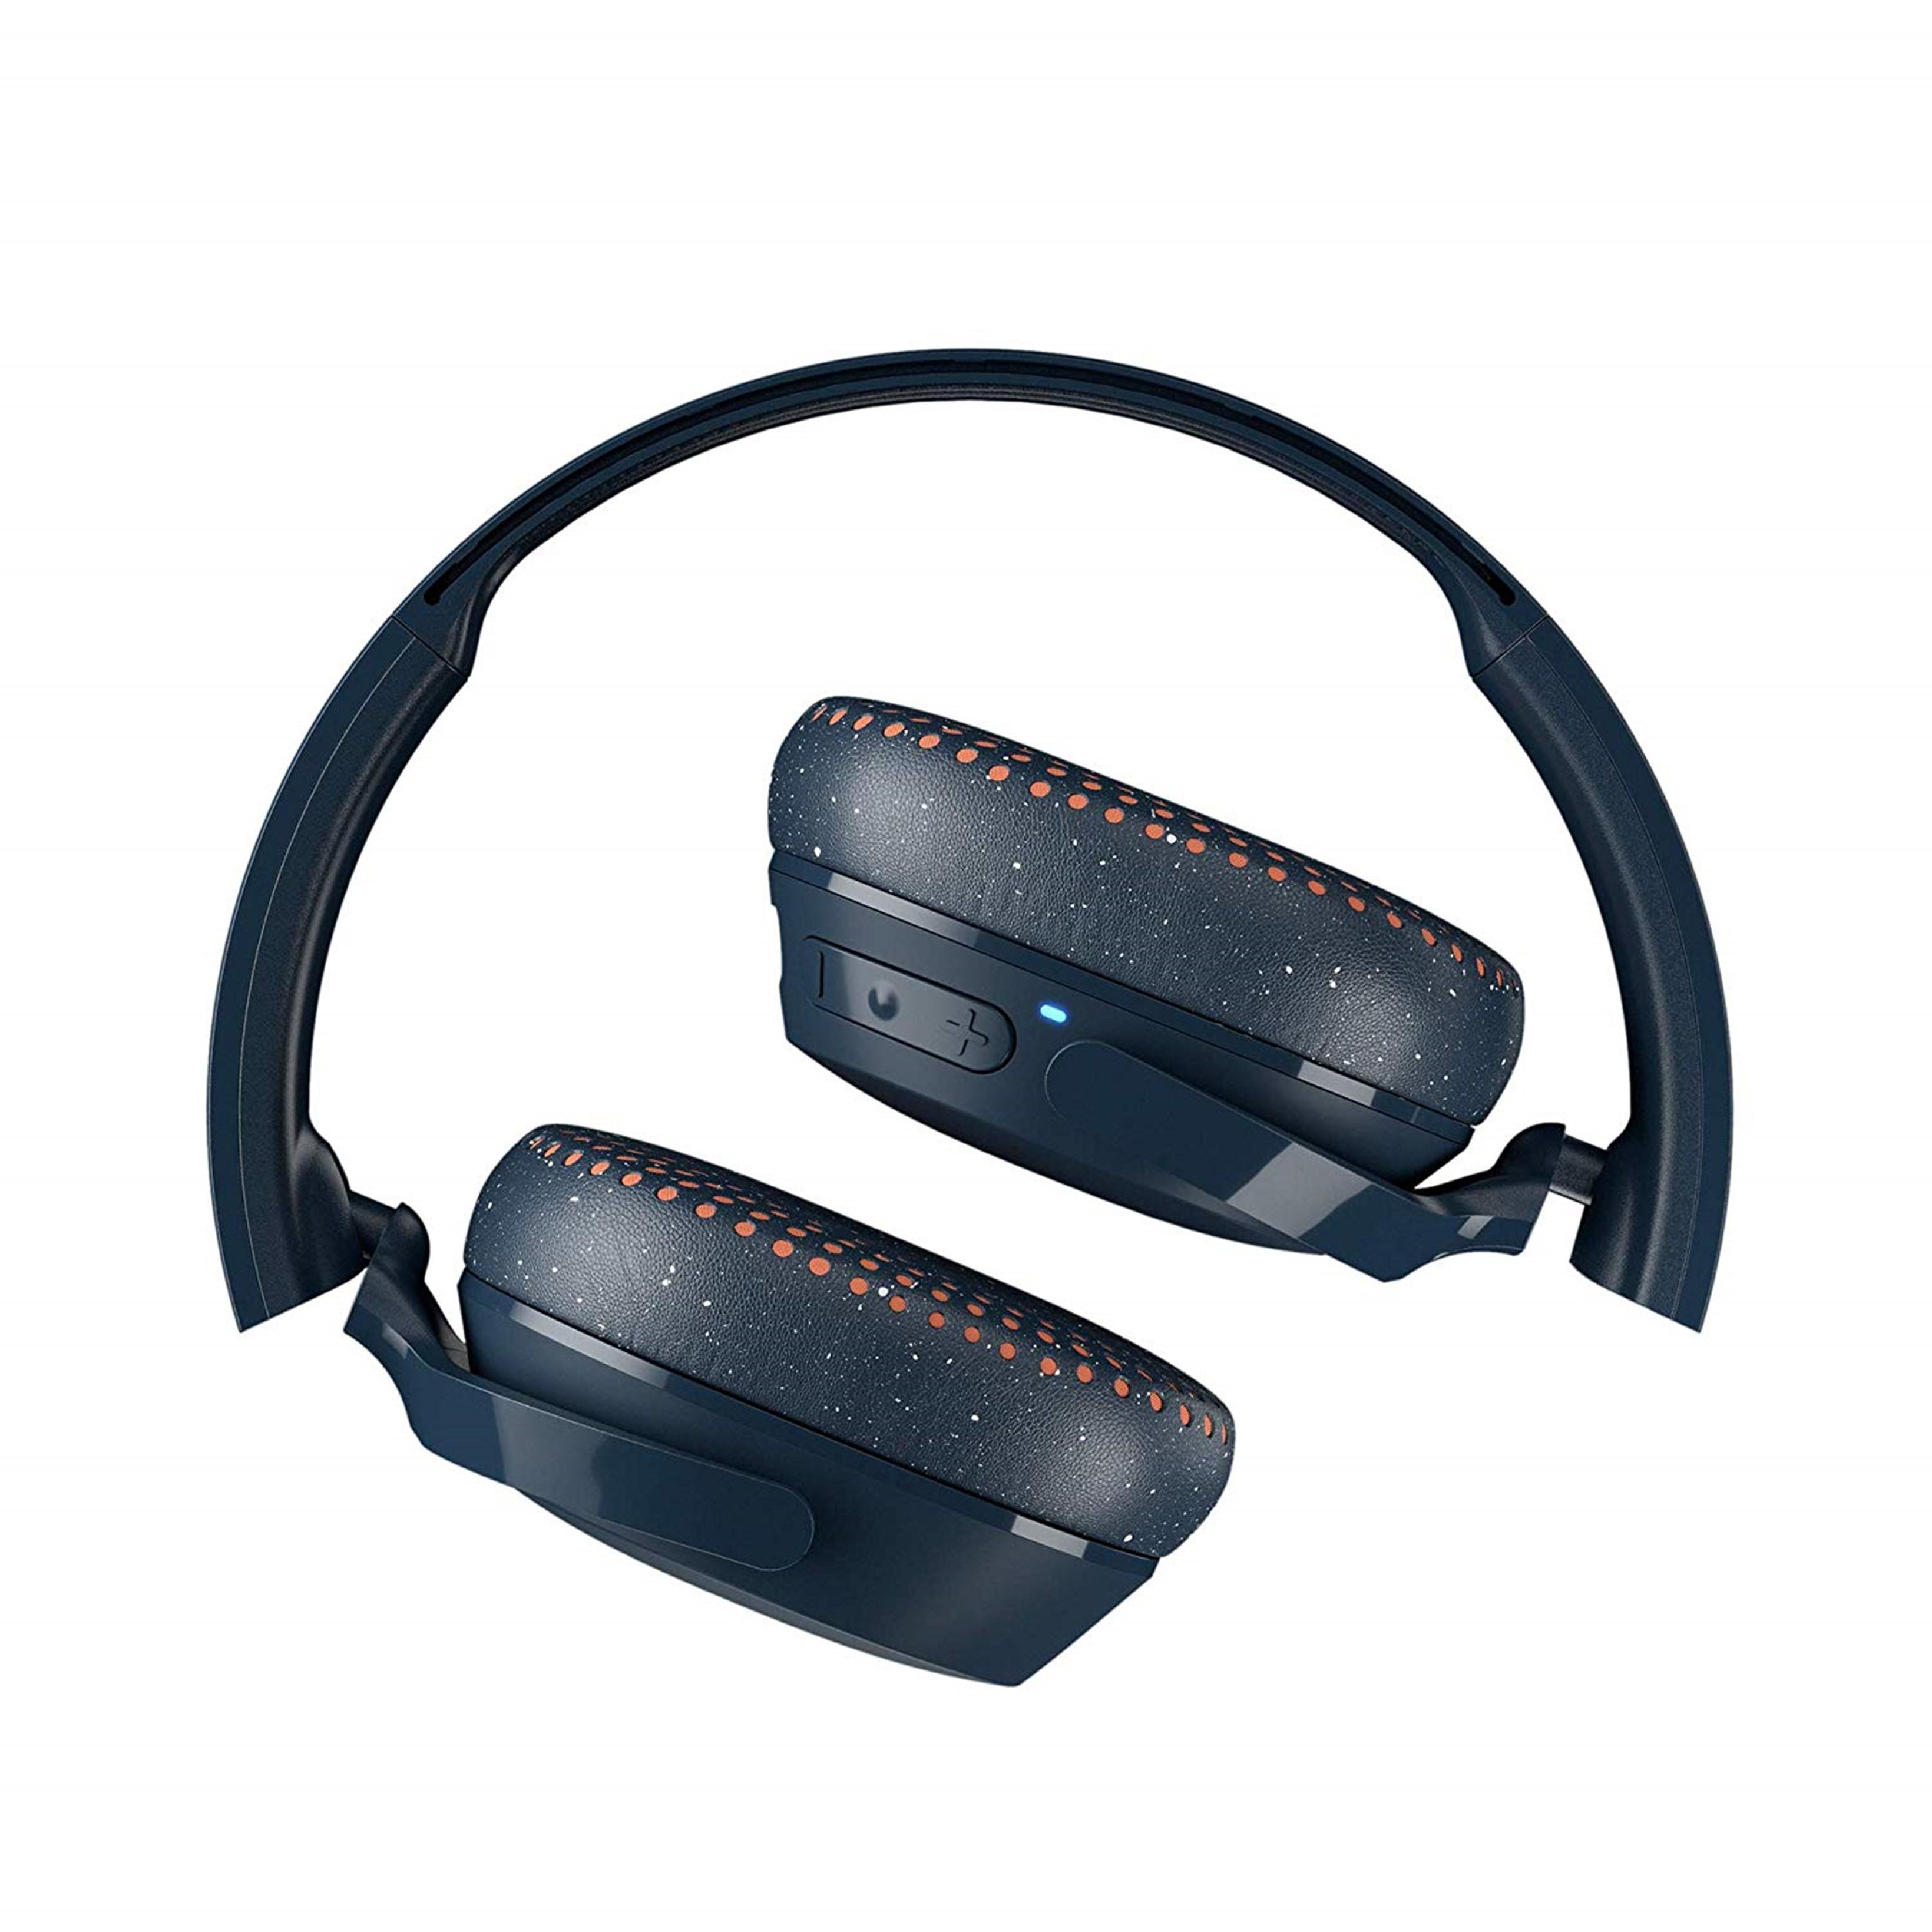 Skullcandy Riff Blue/Speckle/Sunset Bluetooth Headphones - 4